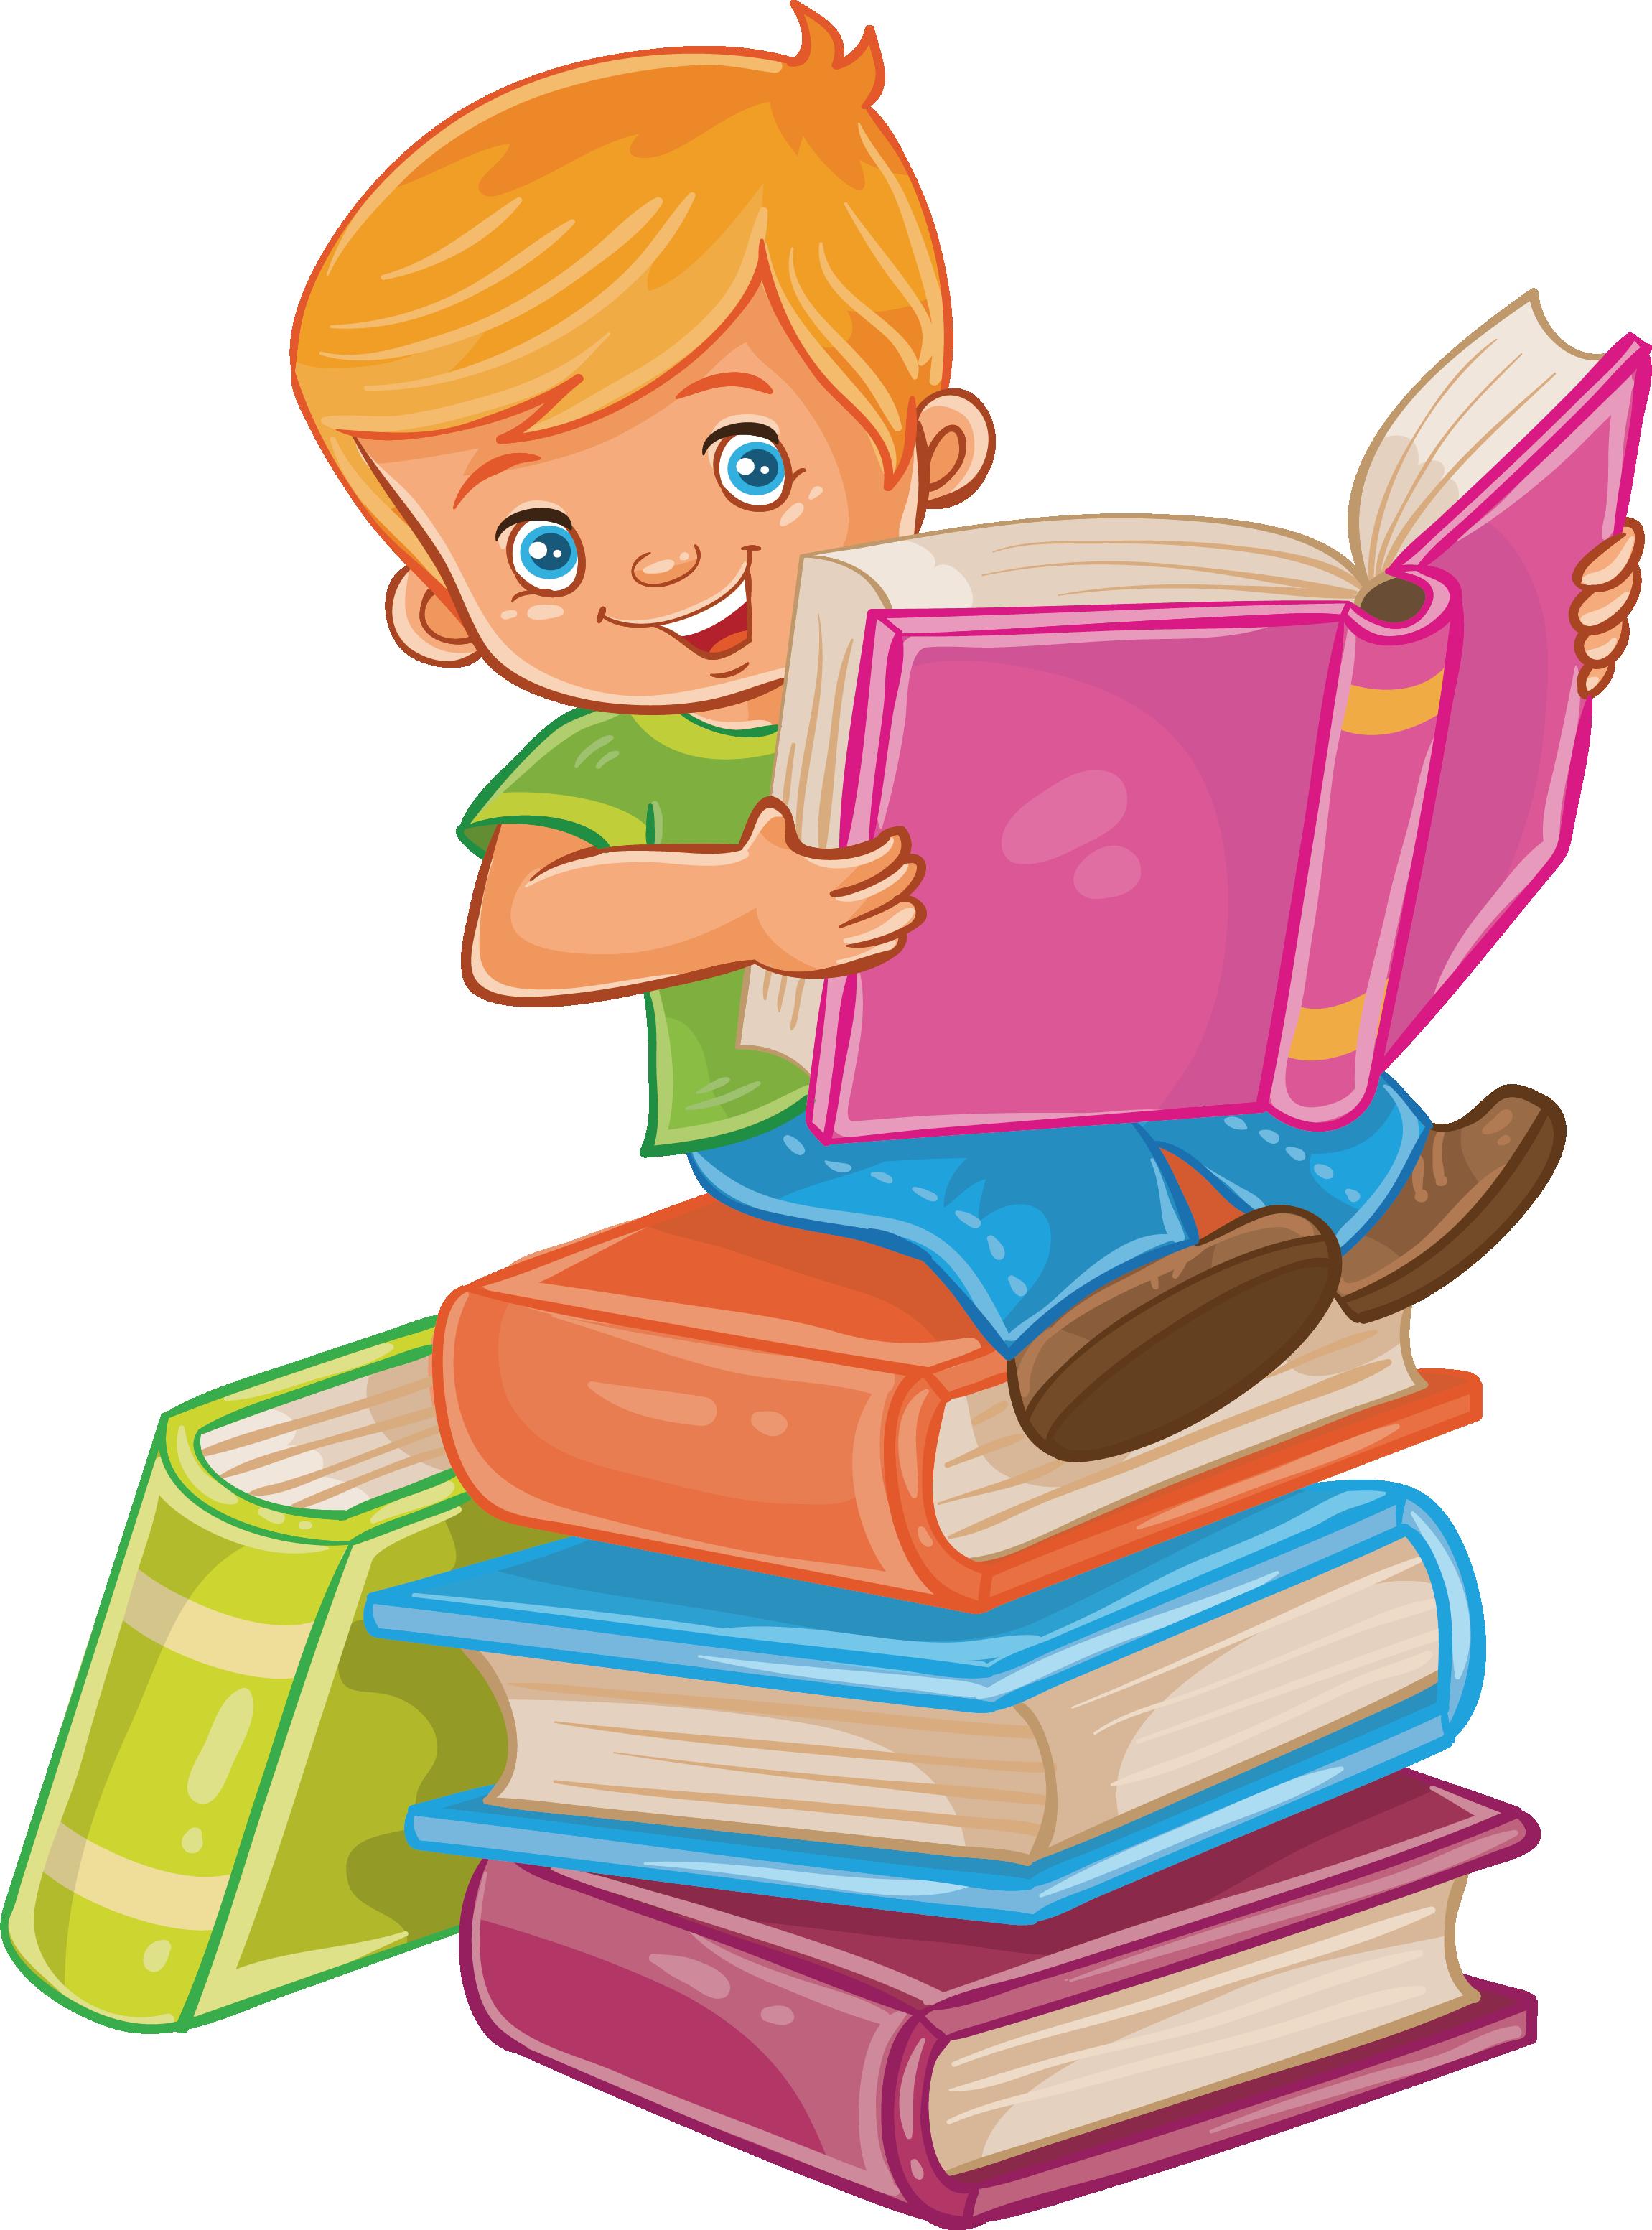 apple-sitting-on-books-clipart-14